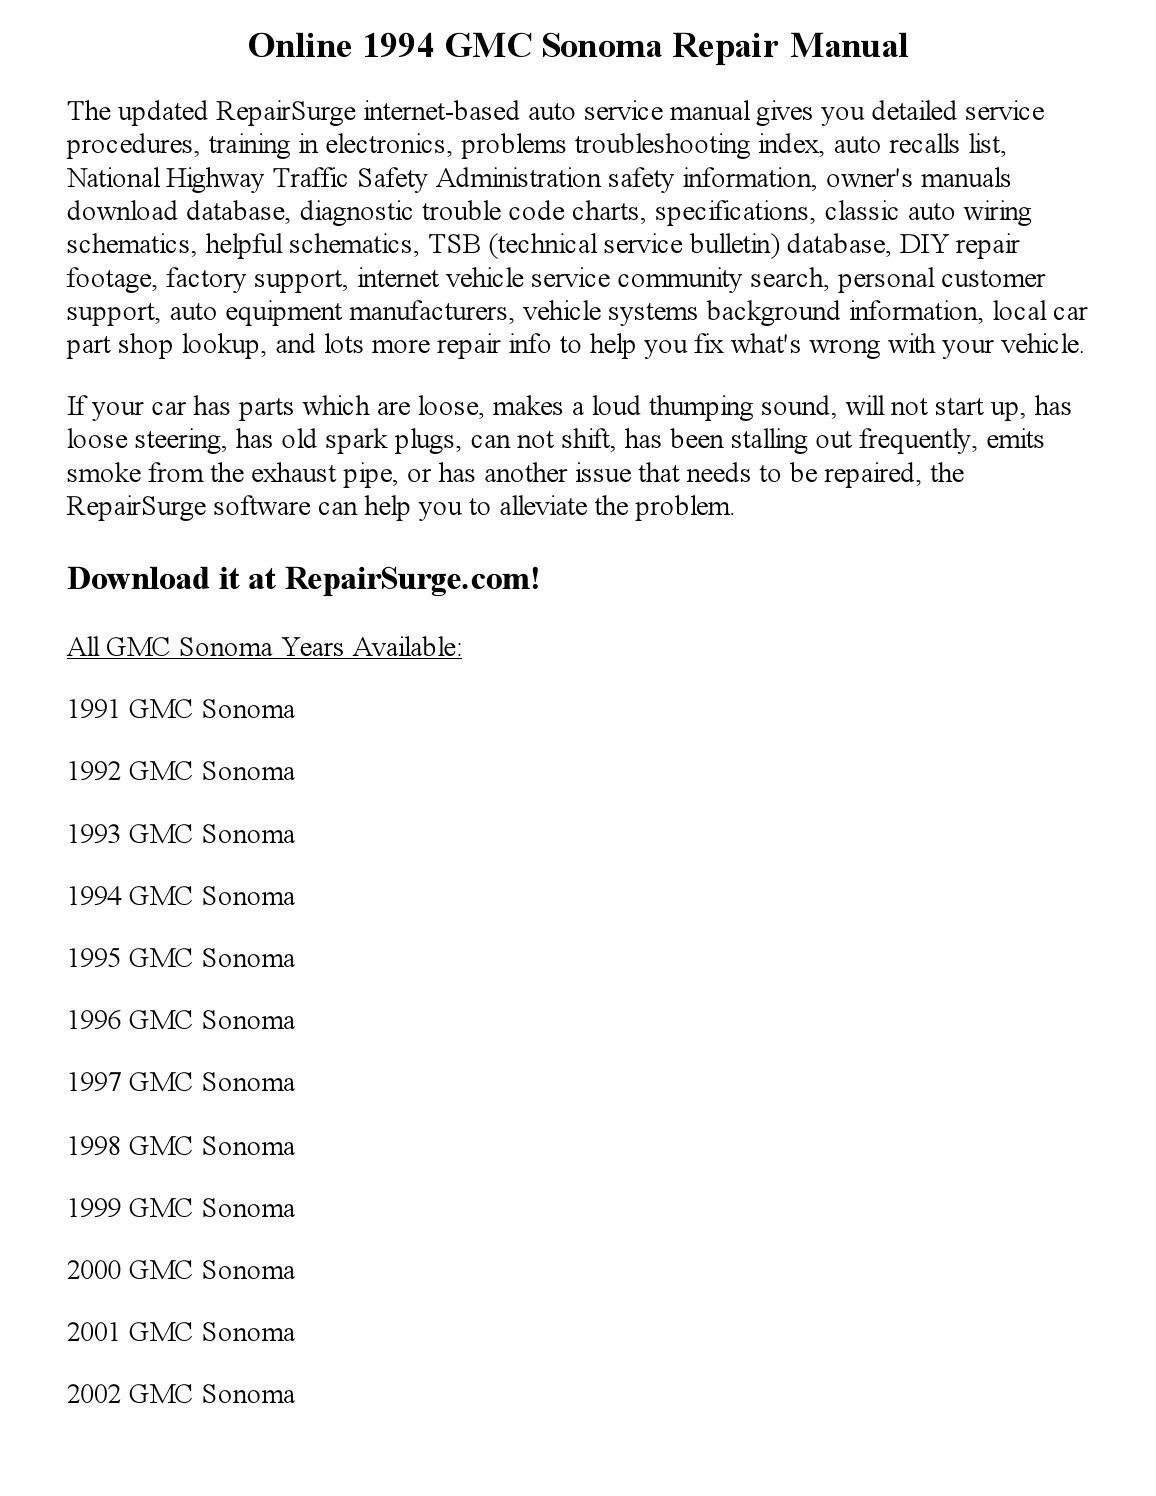 1994 Gmc Sonoma Repair Manual Online By Robertjames Smith Wiring Diagram